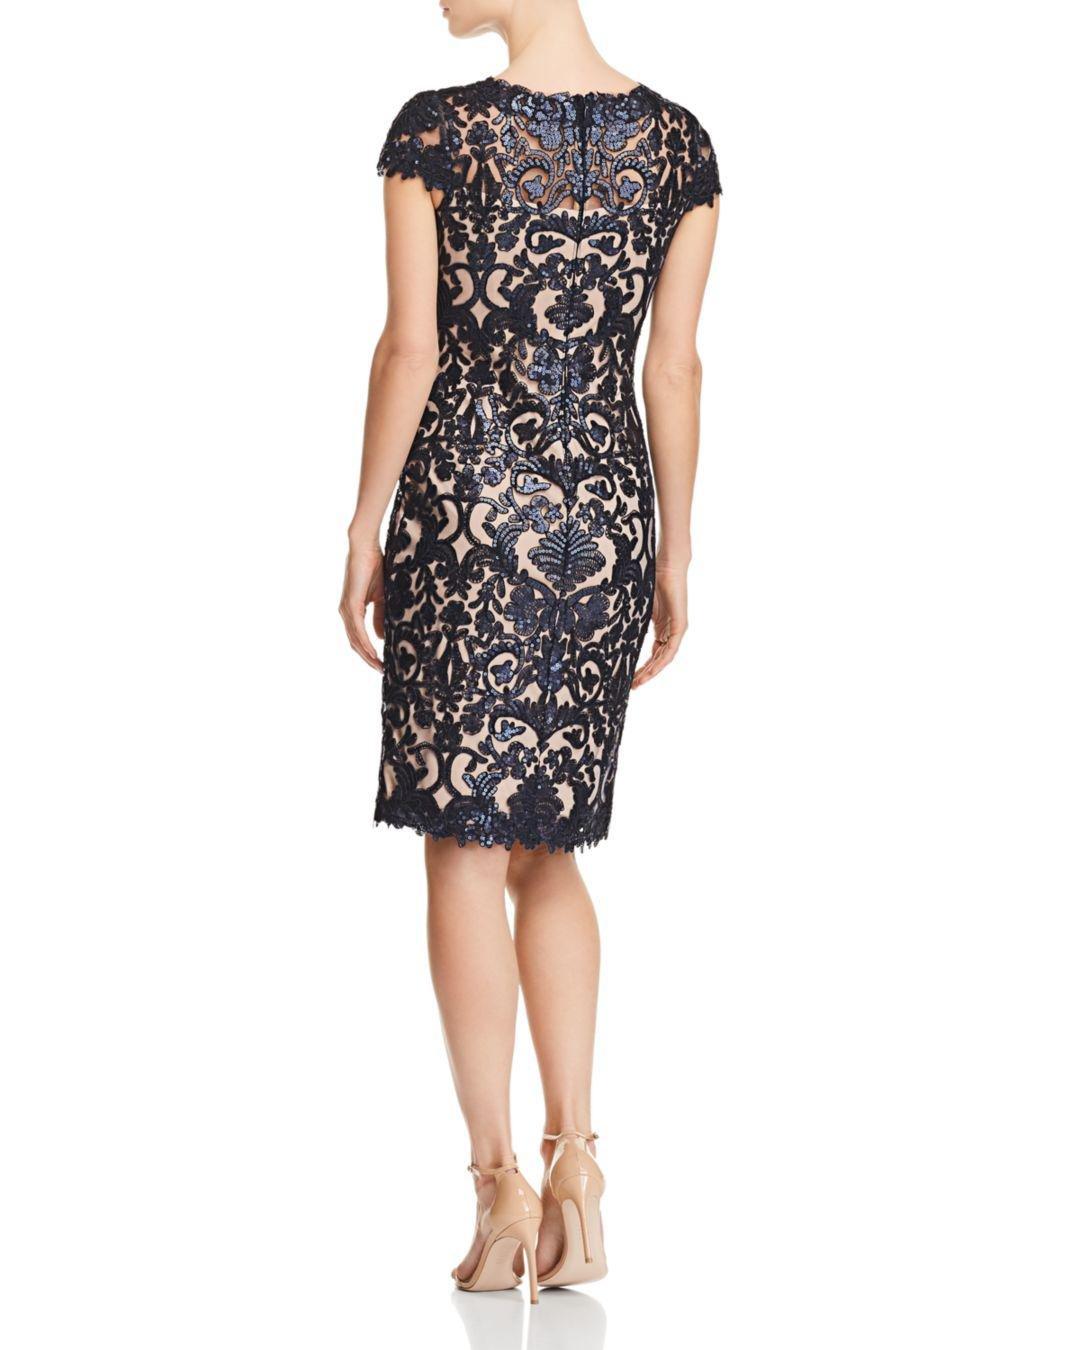 842452e405b1 Lyst - Tadashi Shoji Tadashi Shoji Petites Sequined Damask Dress in Black